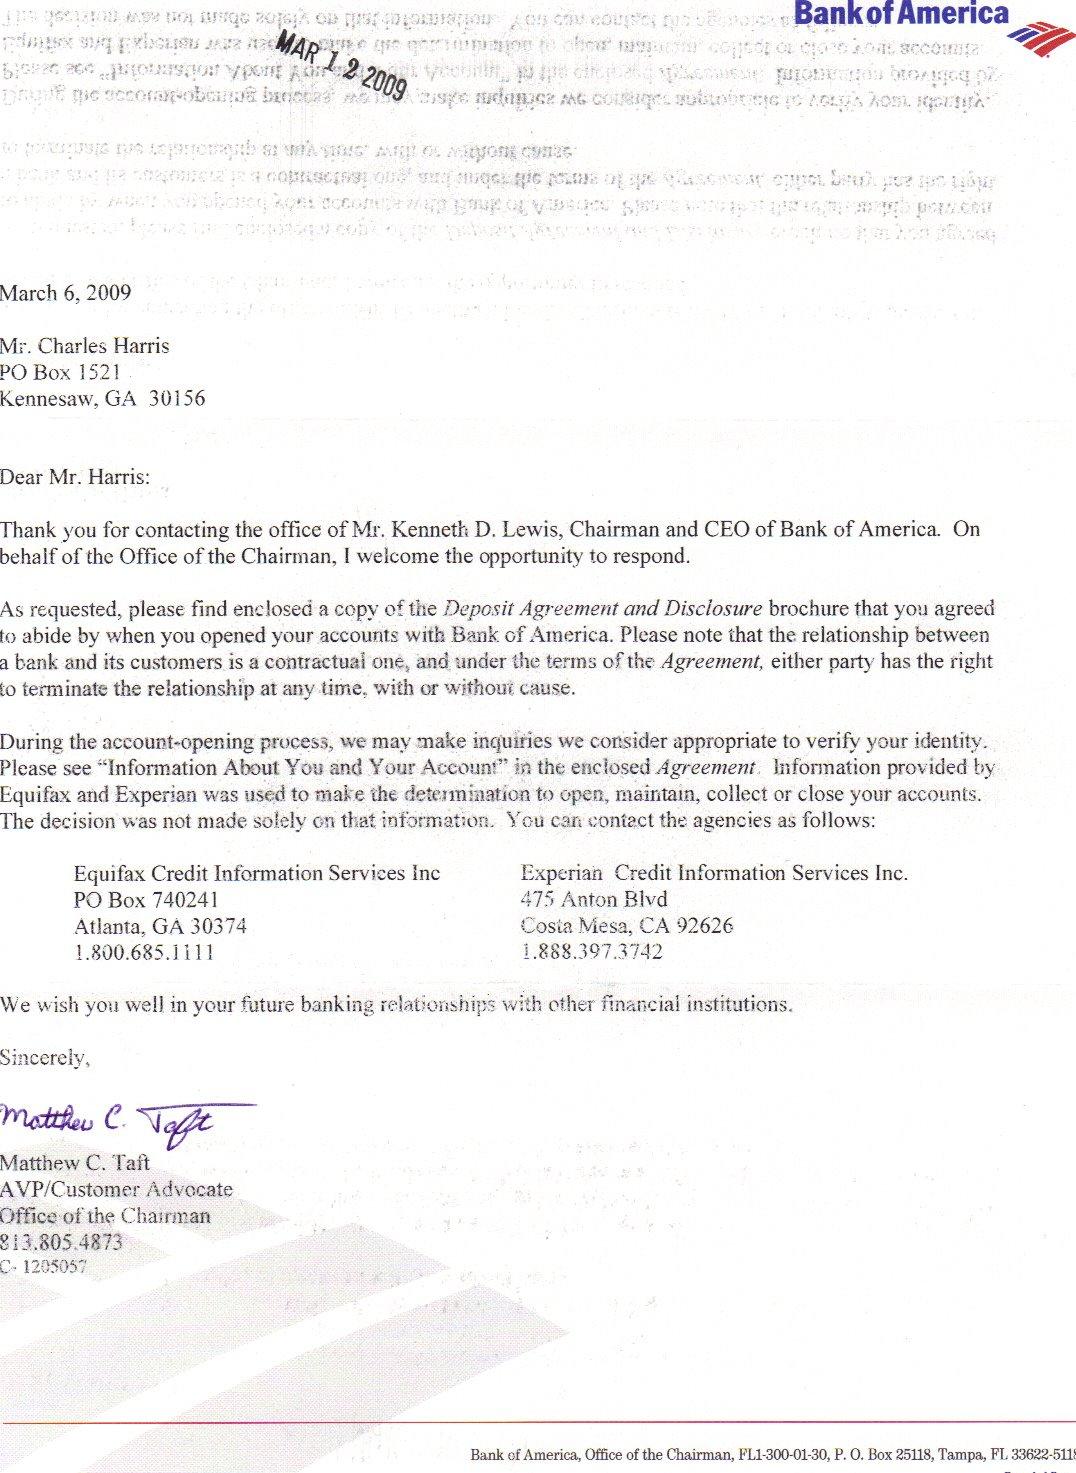 Bank of america verified by visa : Red lobster card